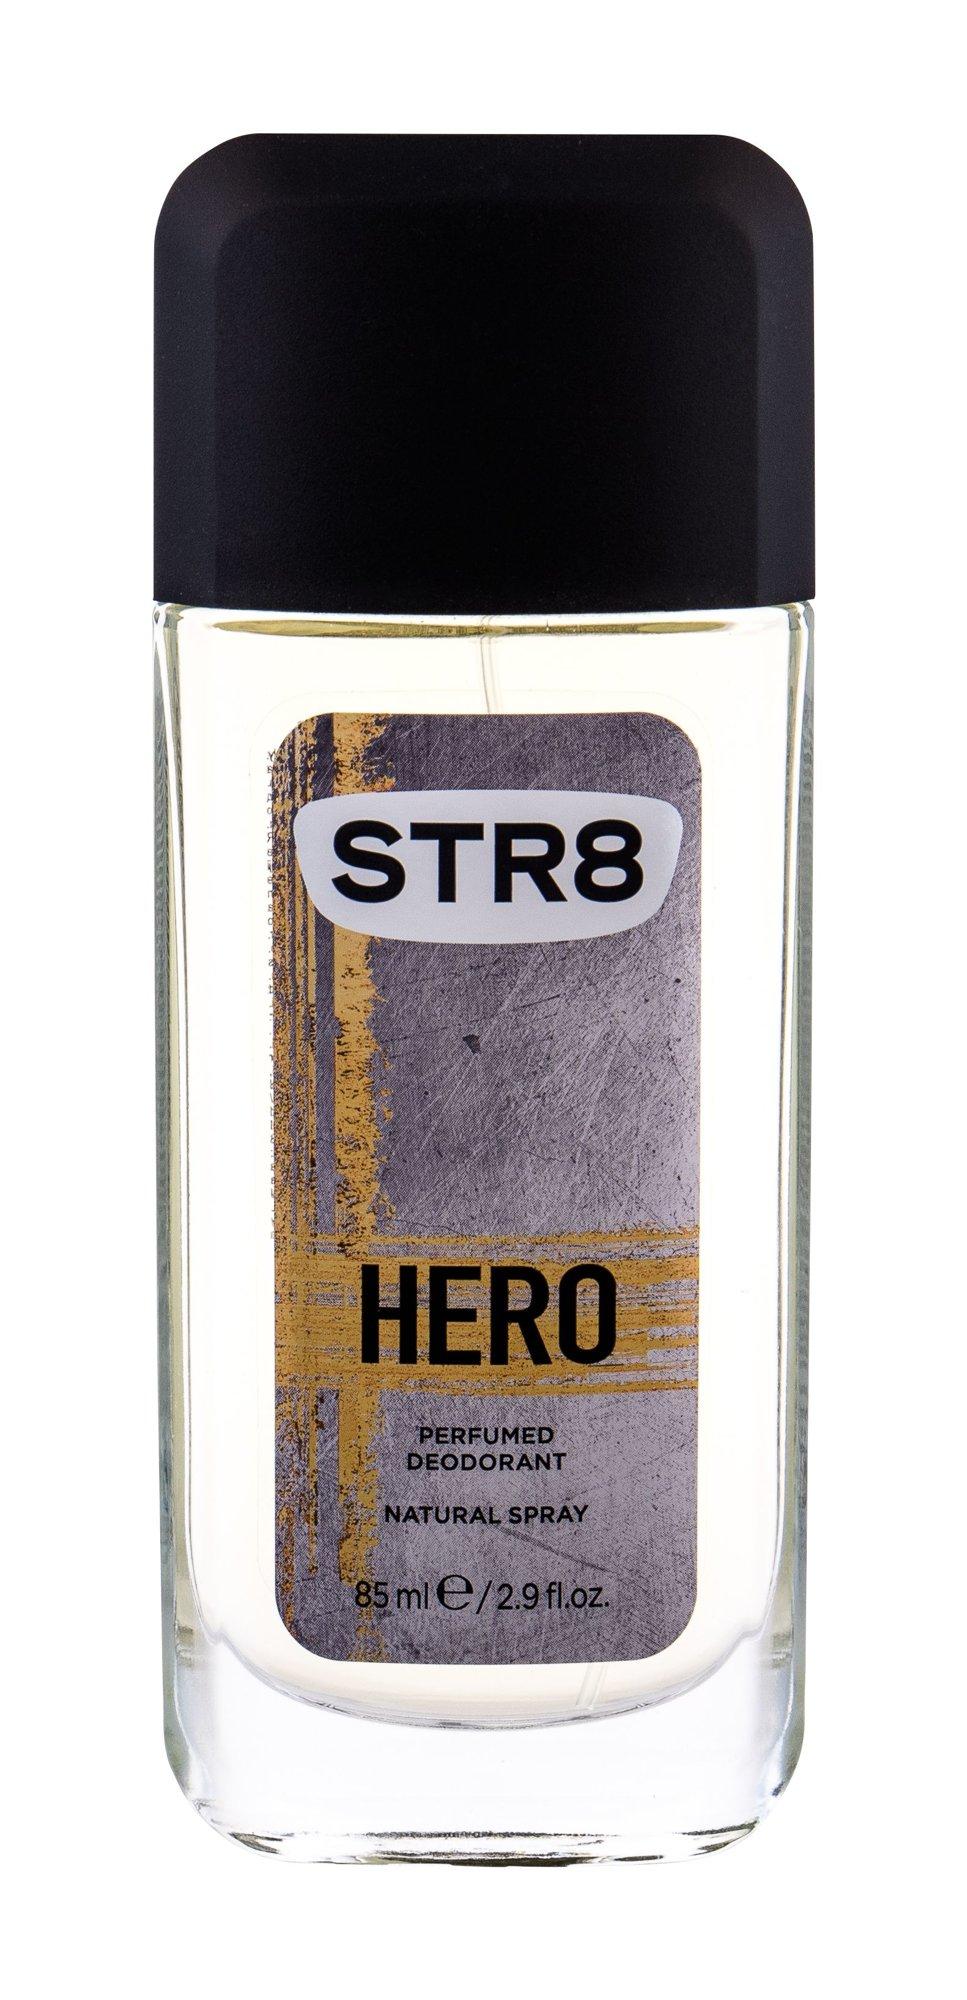 STR8 Hero Deodorant 85ml